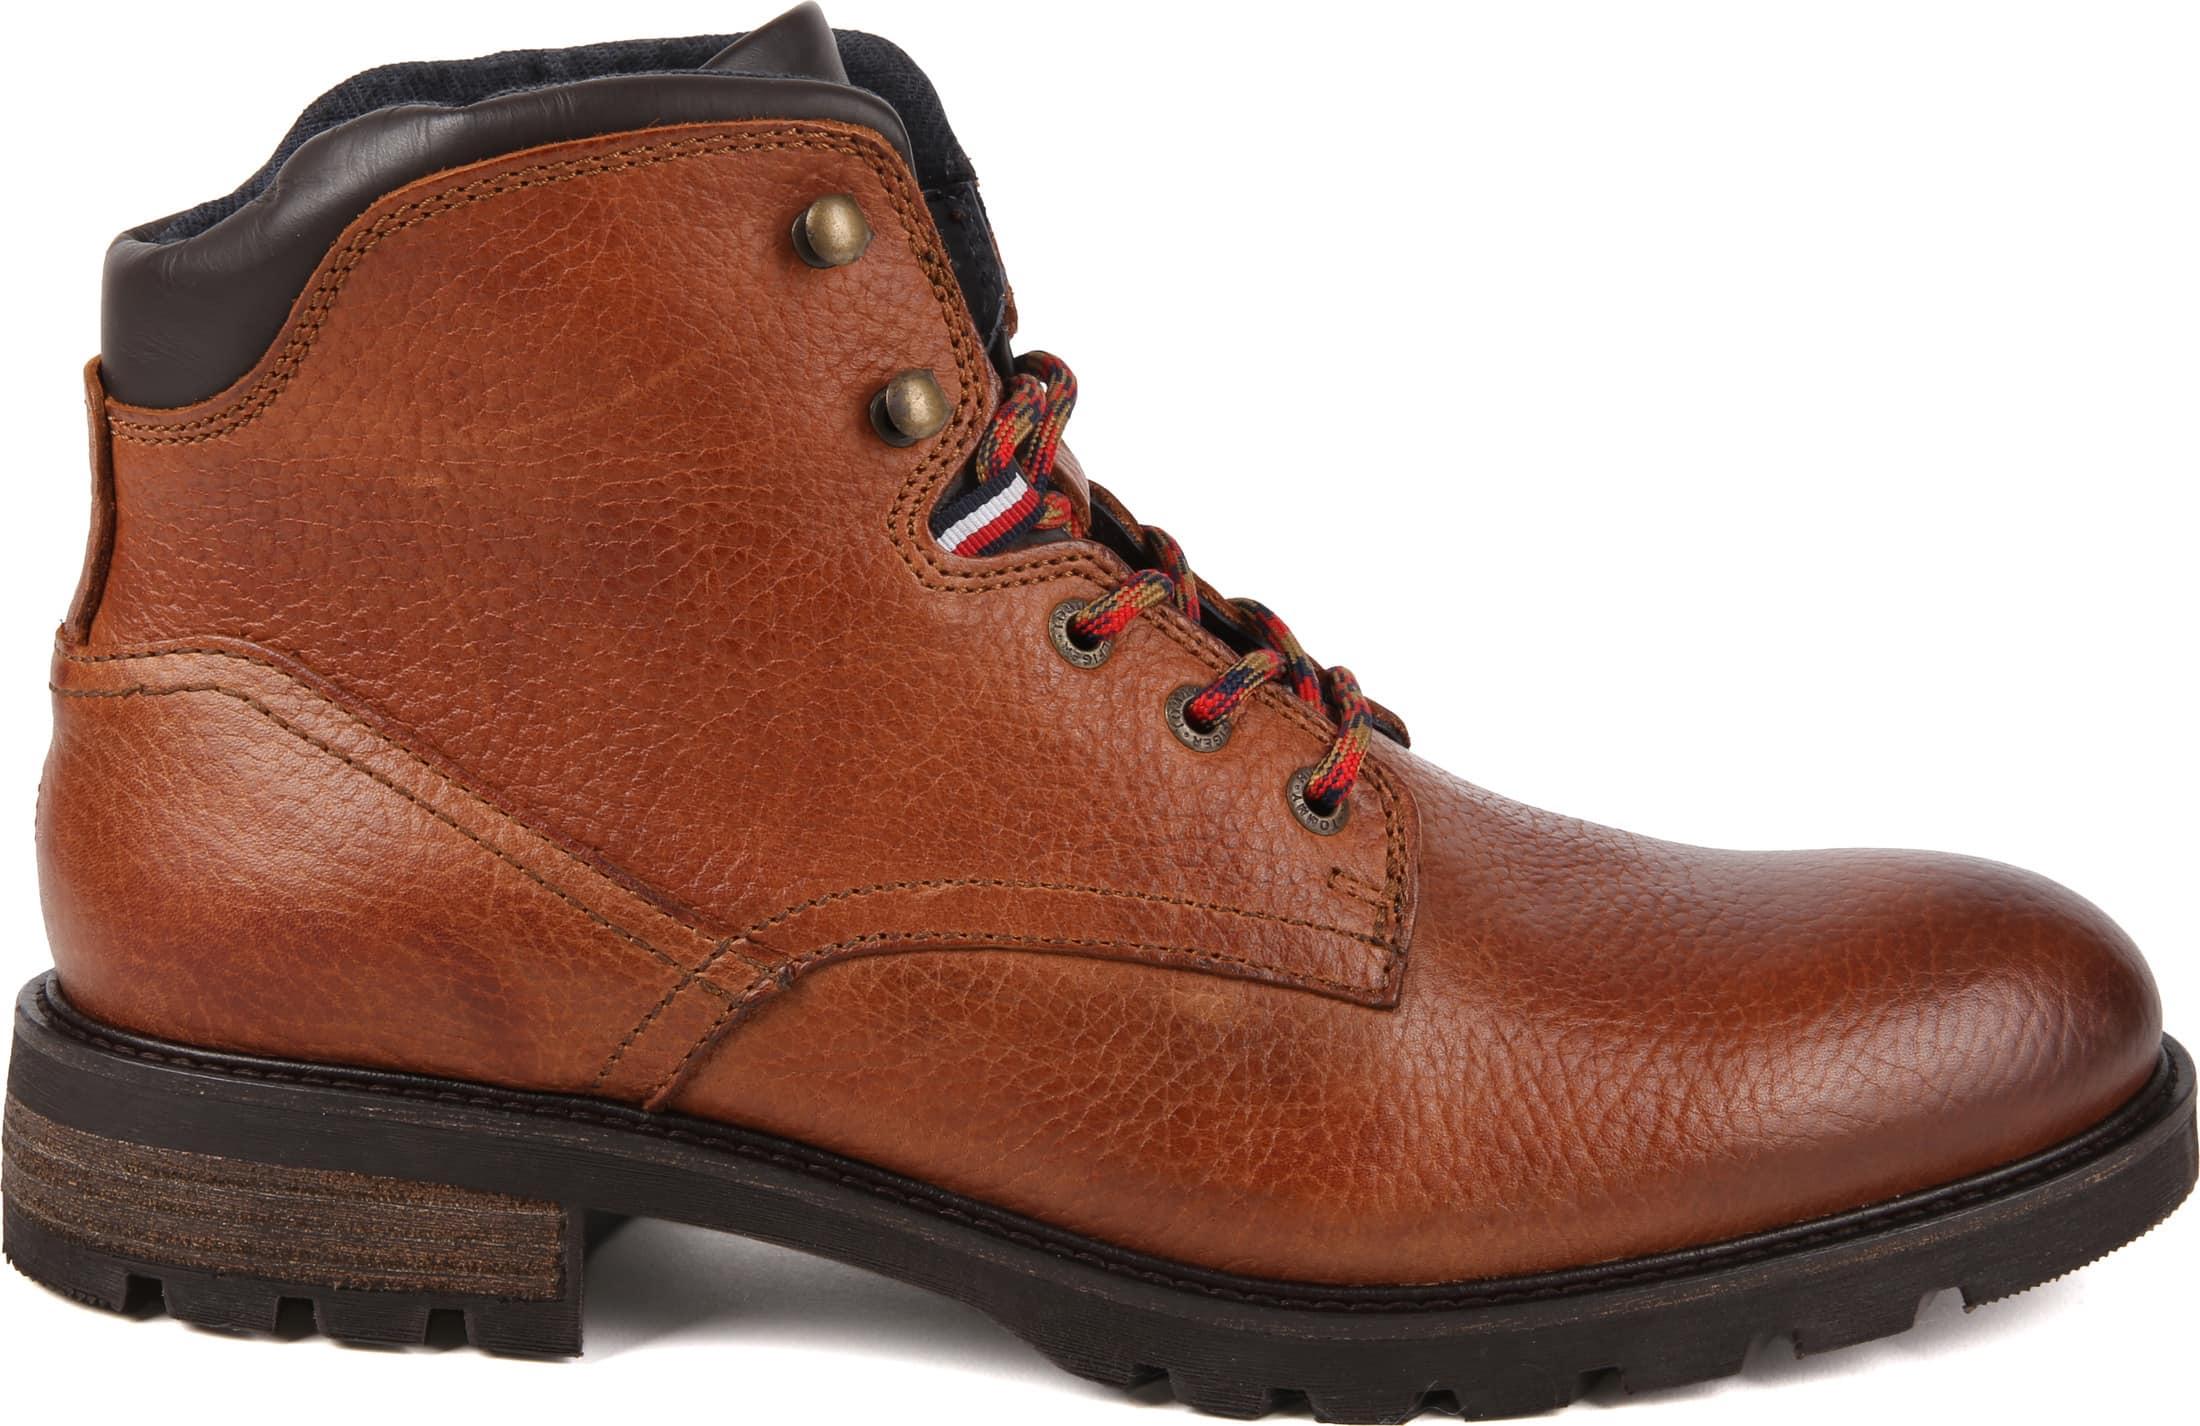 Tommy Hilfiger Boots Cognac foto 0